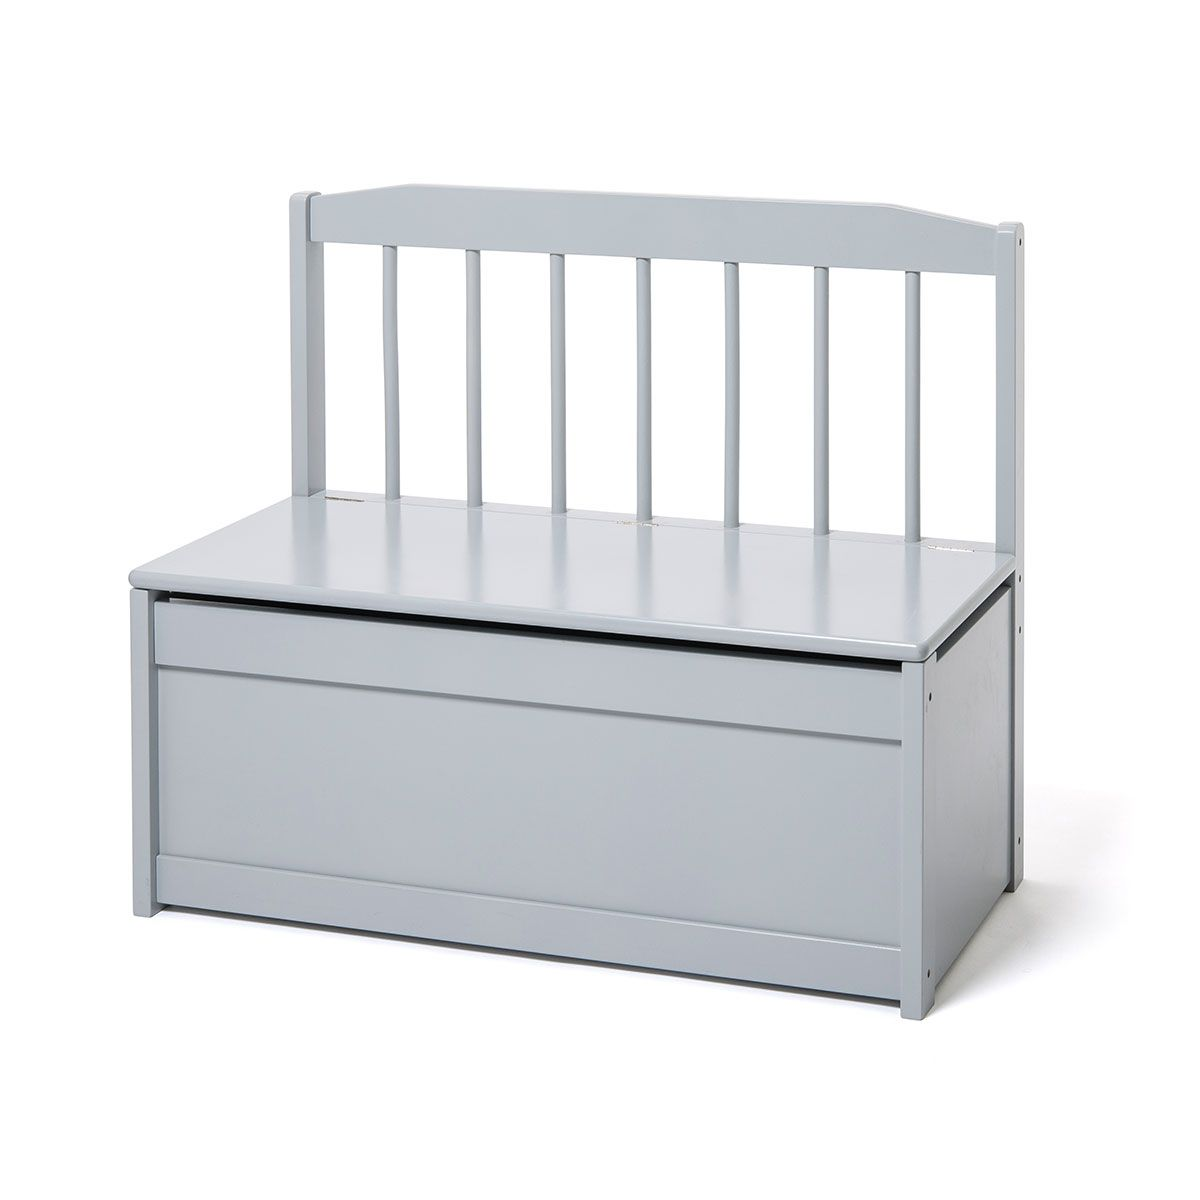 Banc Coffre Gris Oxybul Pour Enfant Dès La Naissance Oxybul éveil